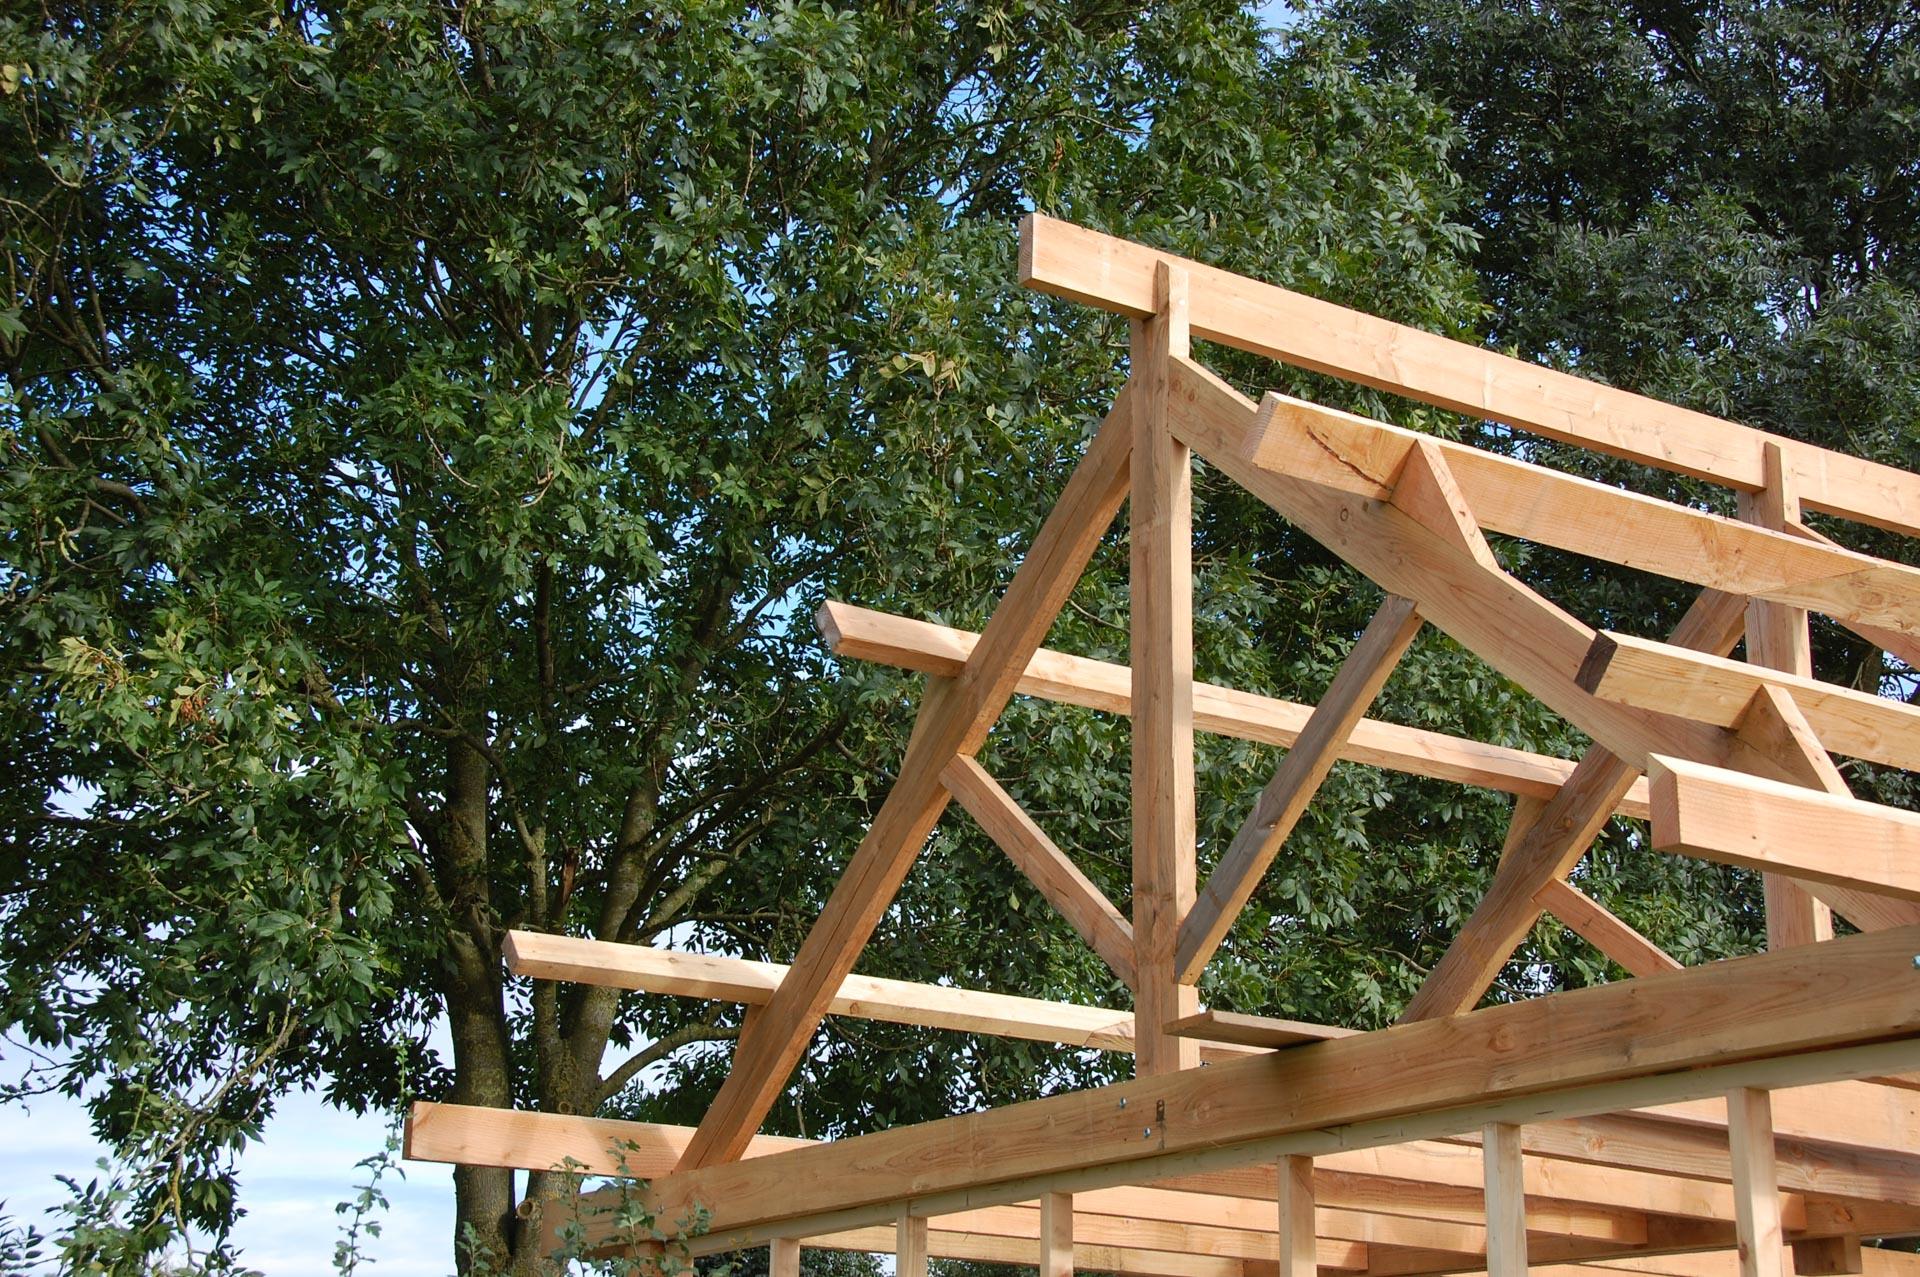 vos-hoveniers-project-tuinhuis-6